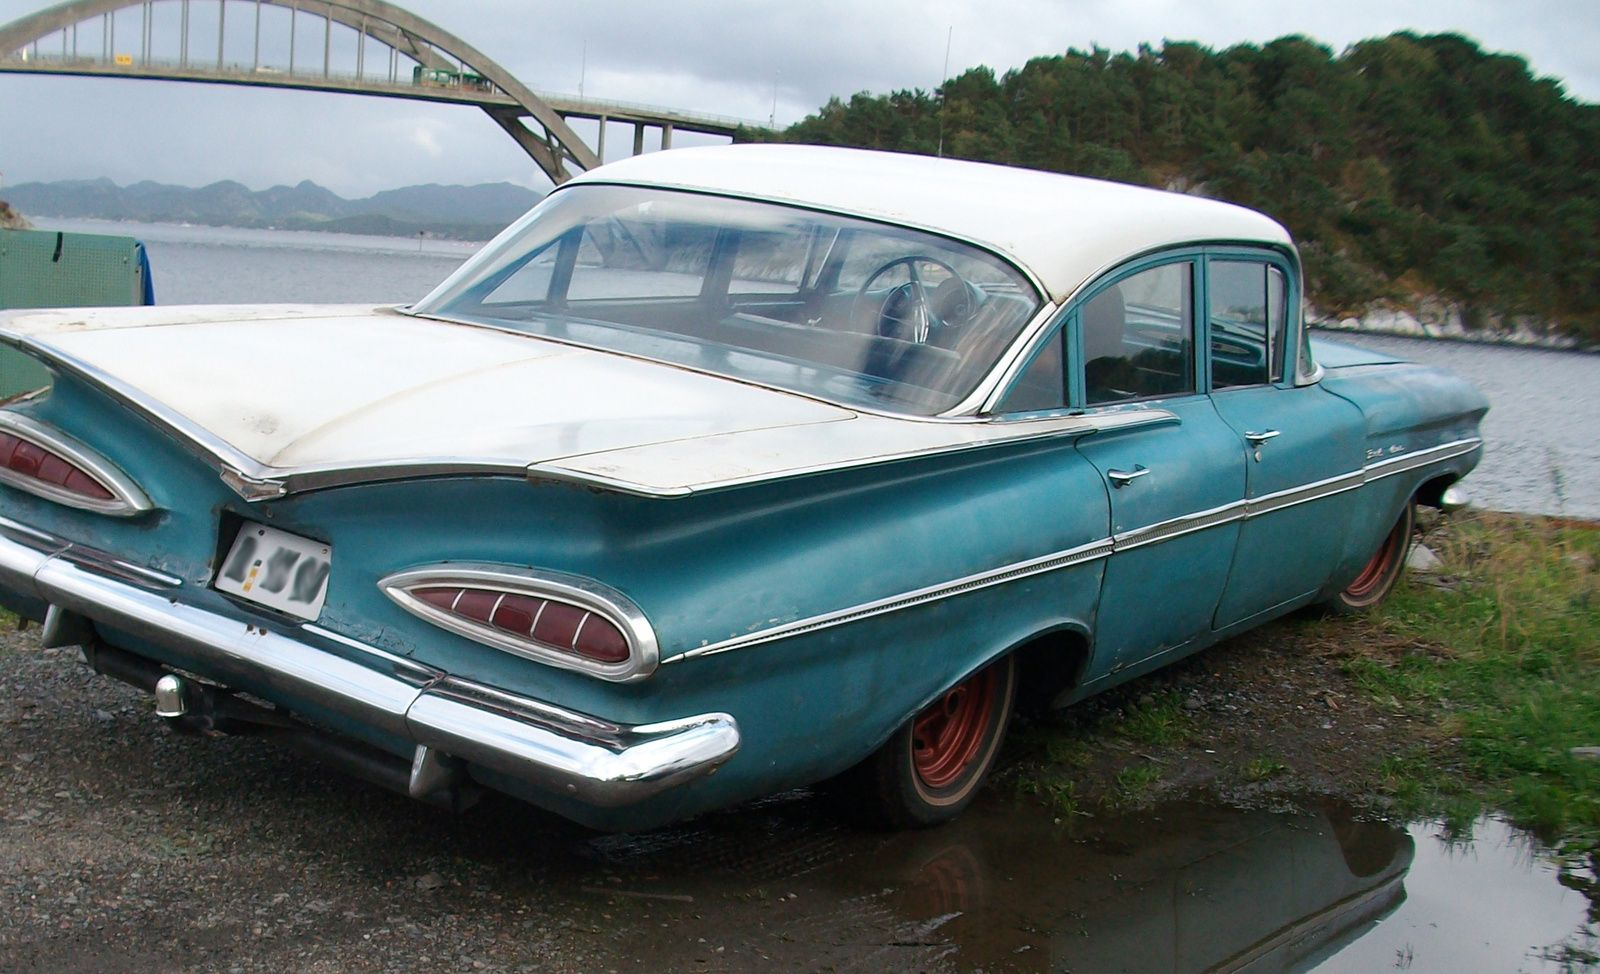 medium resolution of 1962 impala chevrolet classic cars pinterest 1962 chevrolet impala 1959 chevrolet bel air wiring diagram